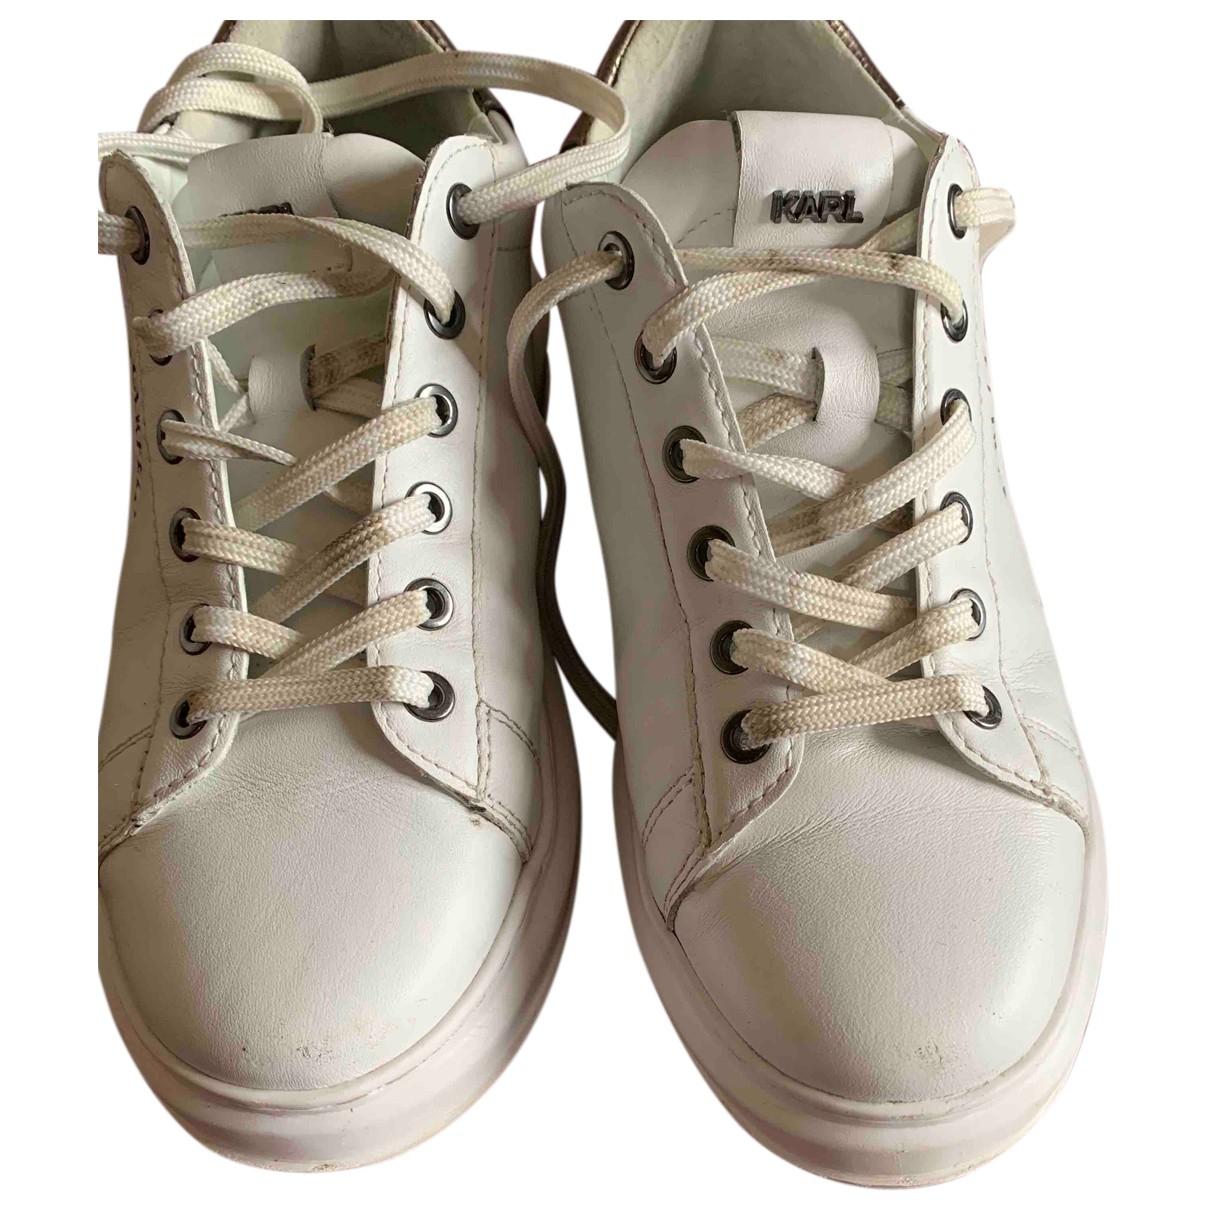 Karl Lagerfeld - Baskets   pour femme en cuir - blanc